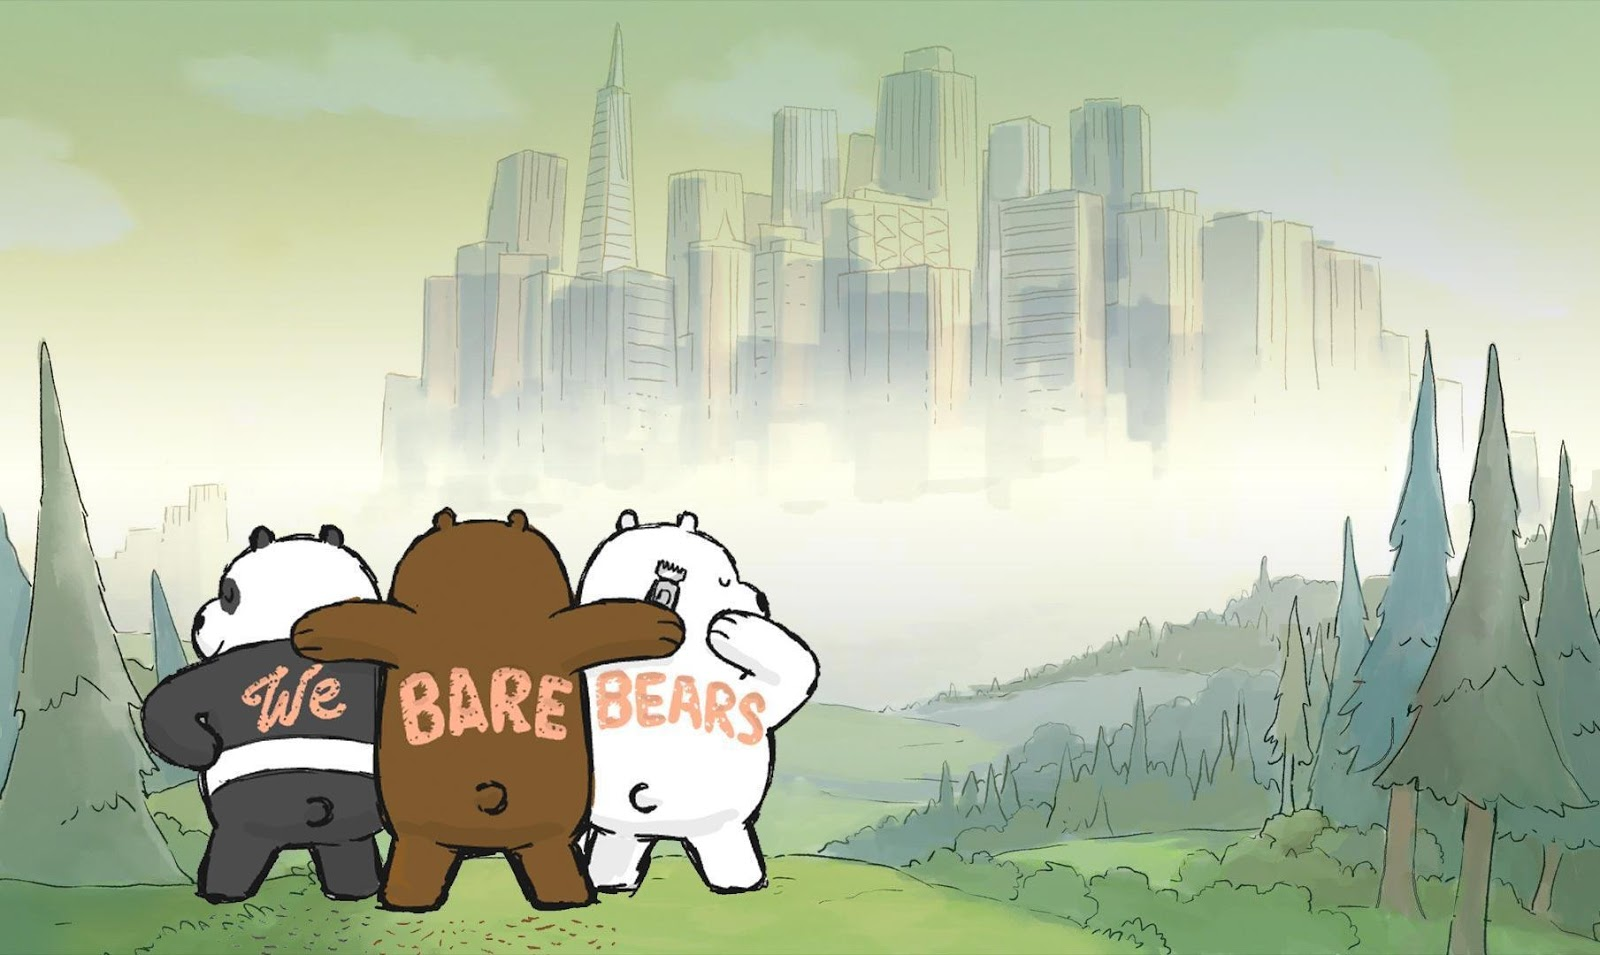 Littlebug 365: หมีสามตัว WE Bare Bears วอลเปเปอร์